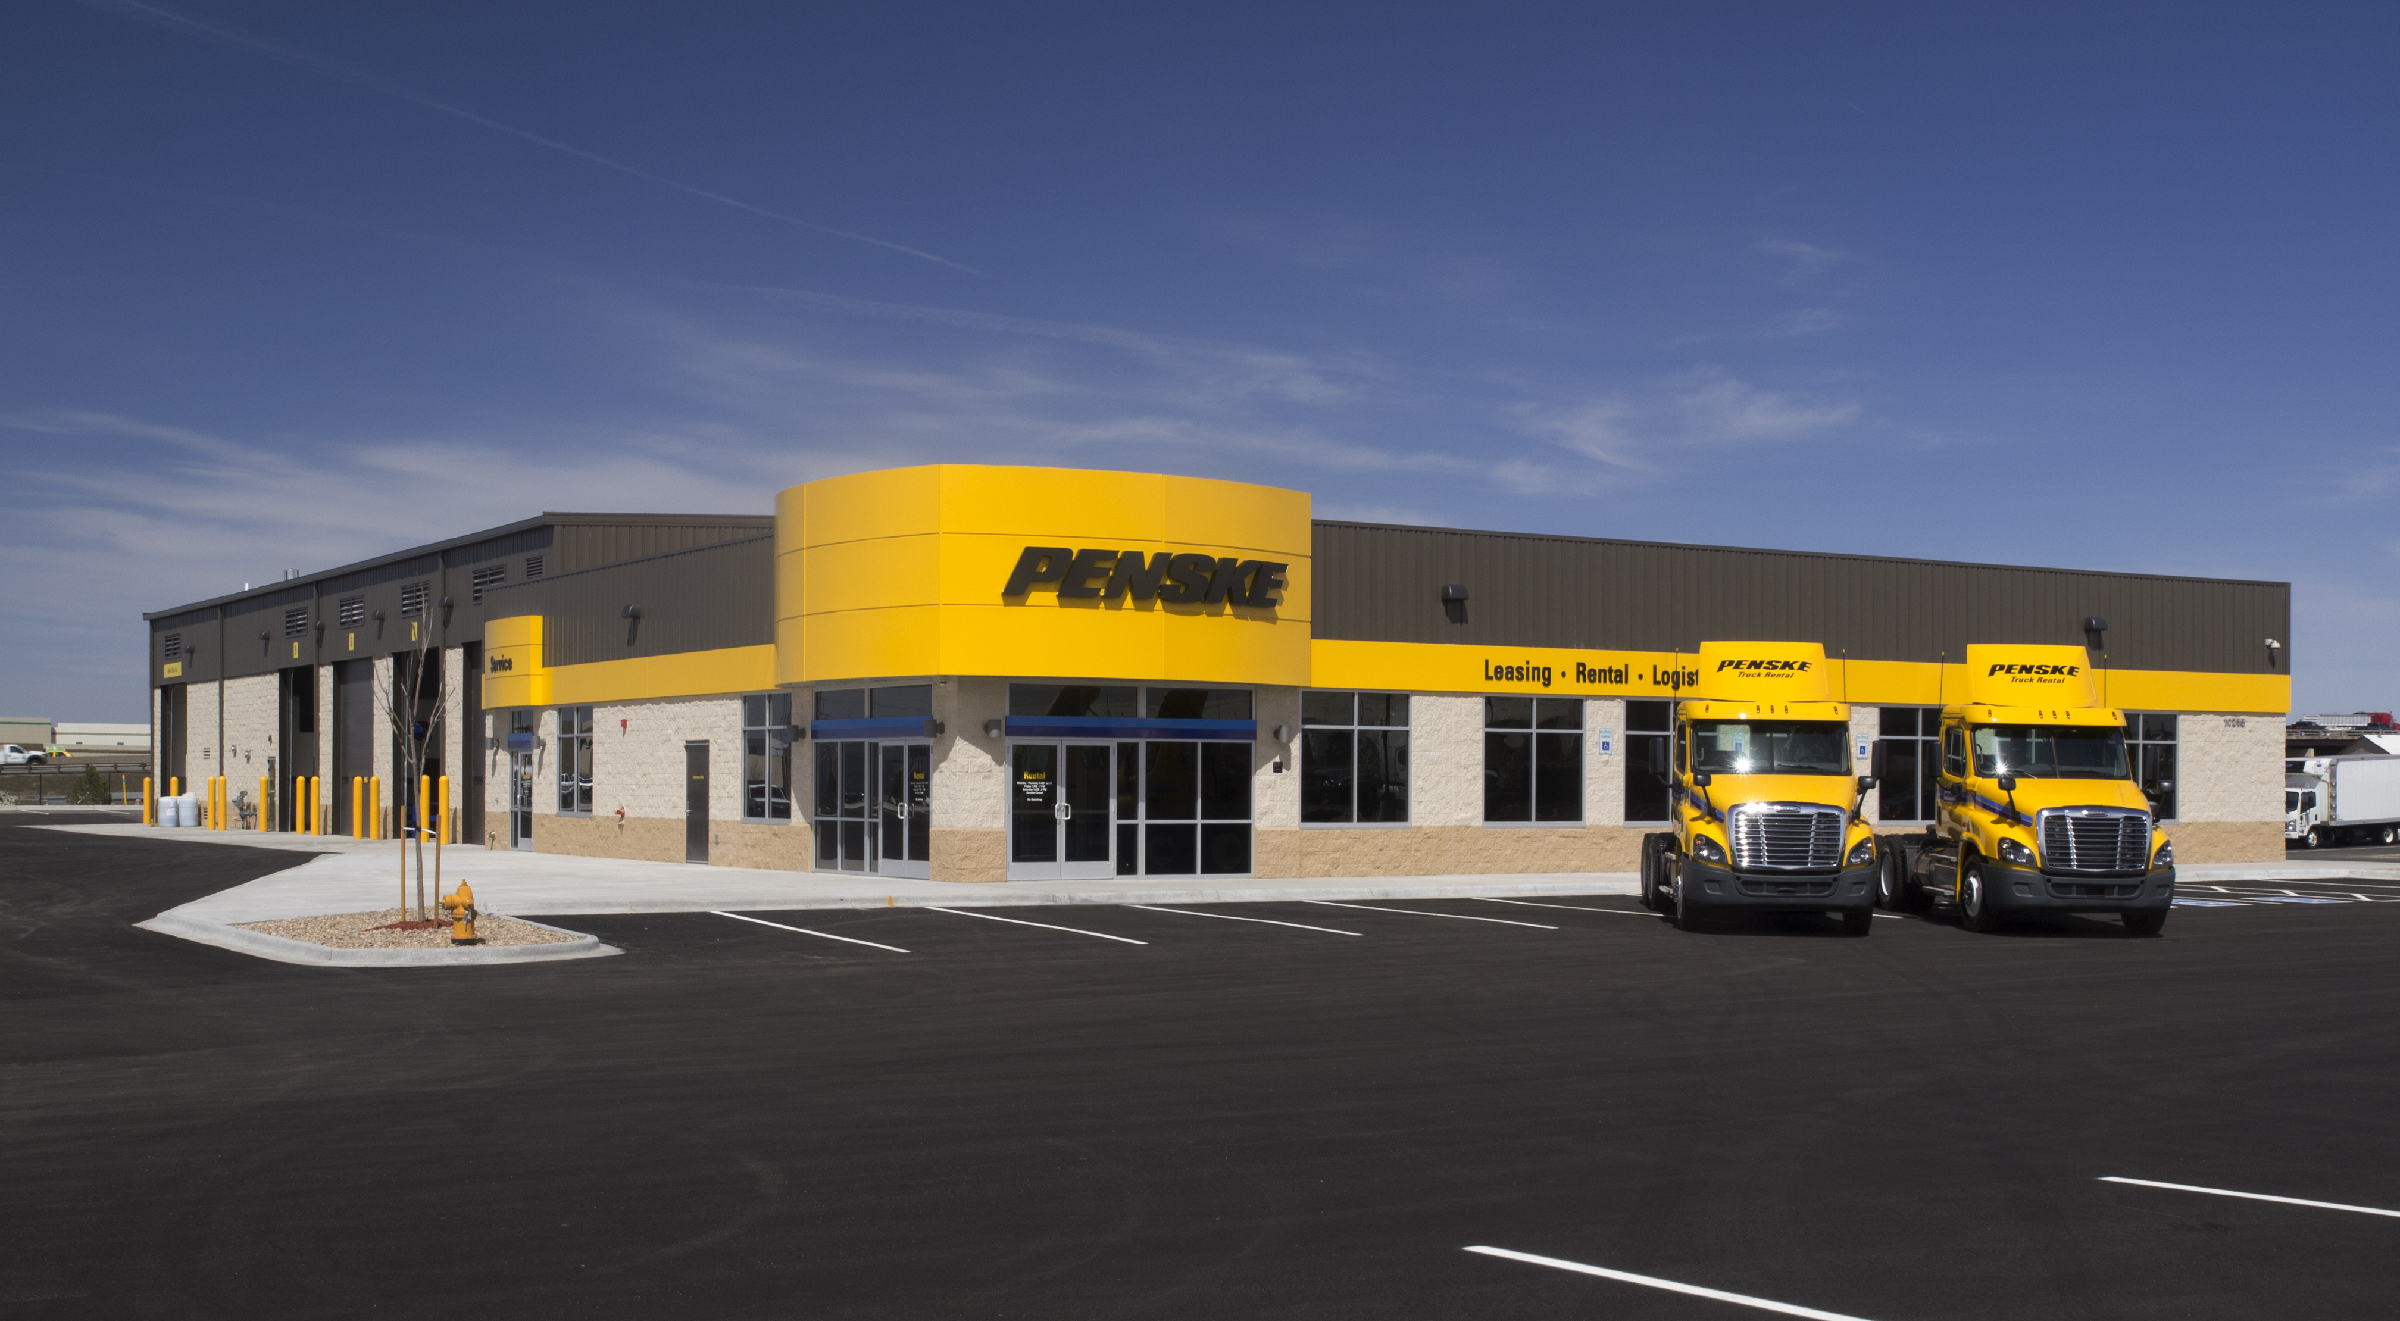 penske truck lease April onthemarch